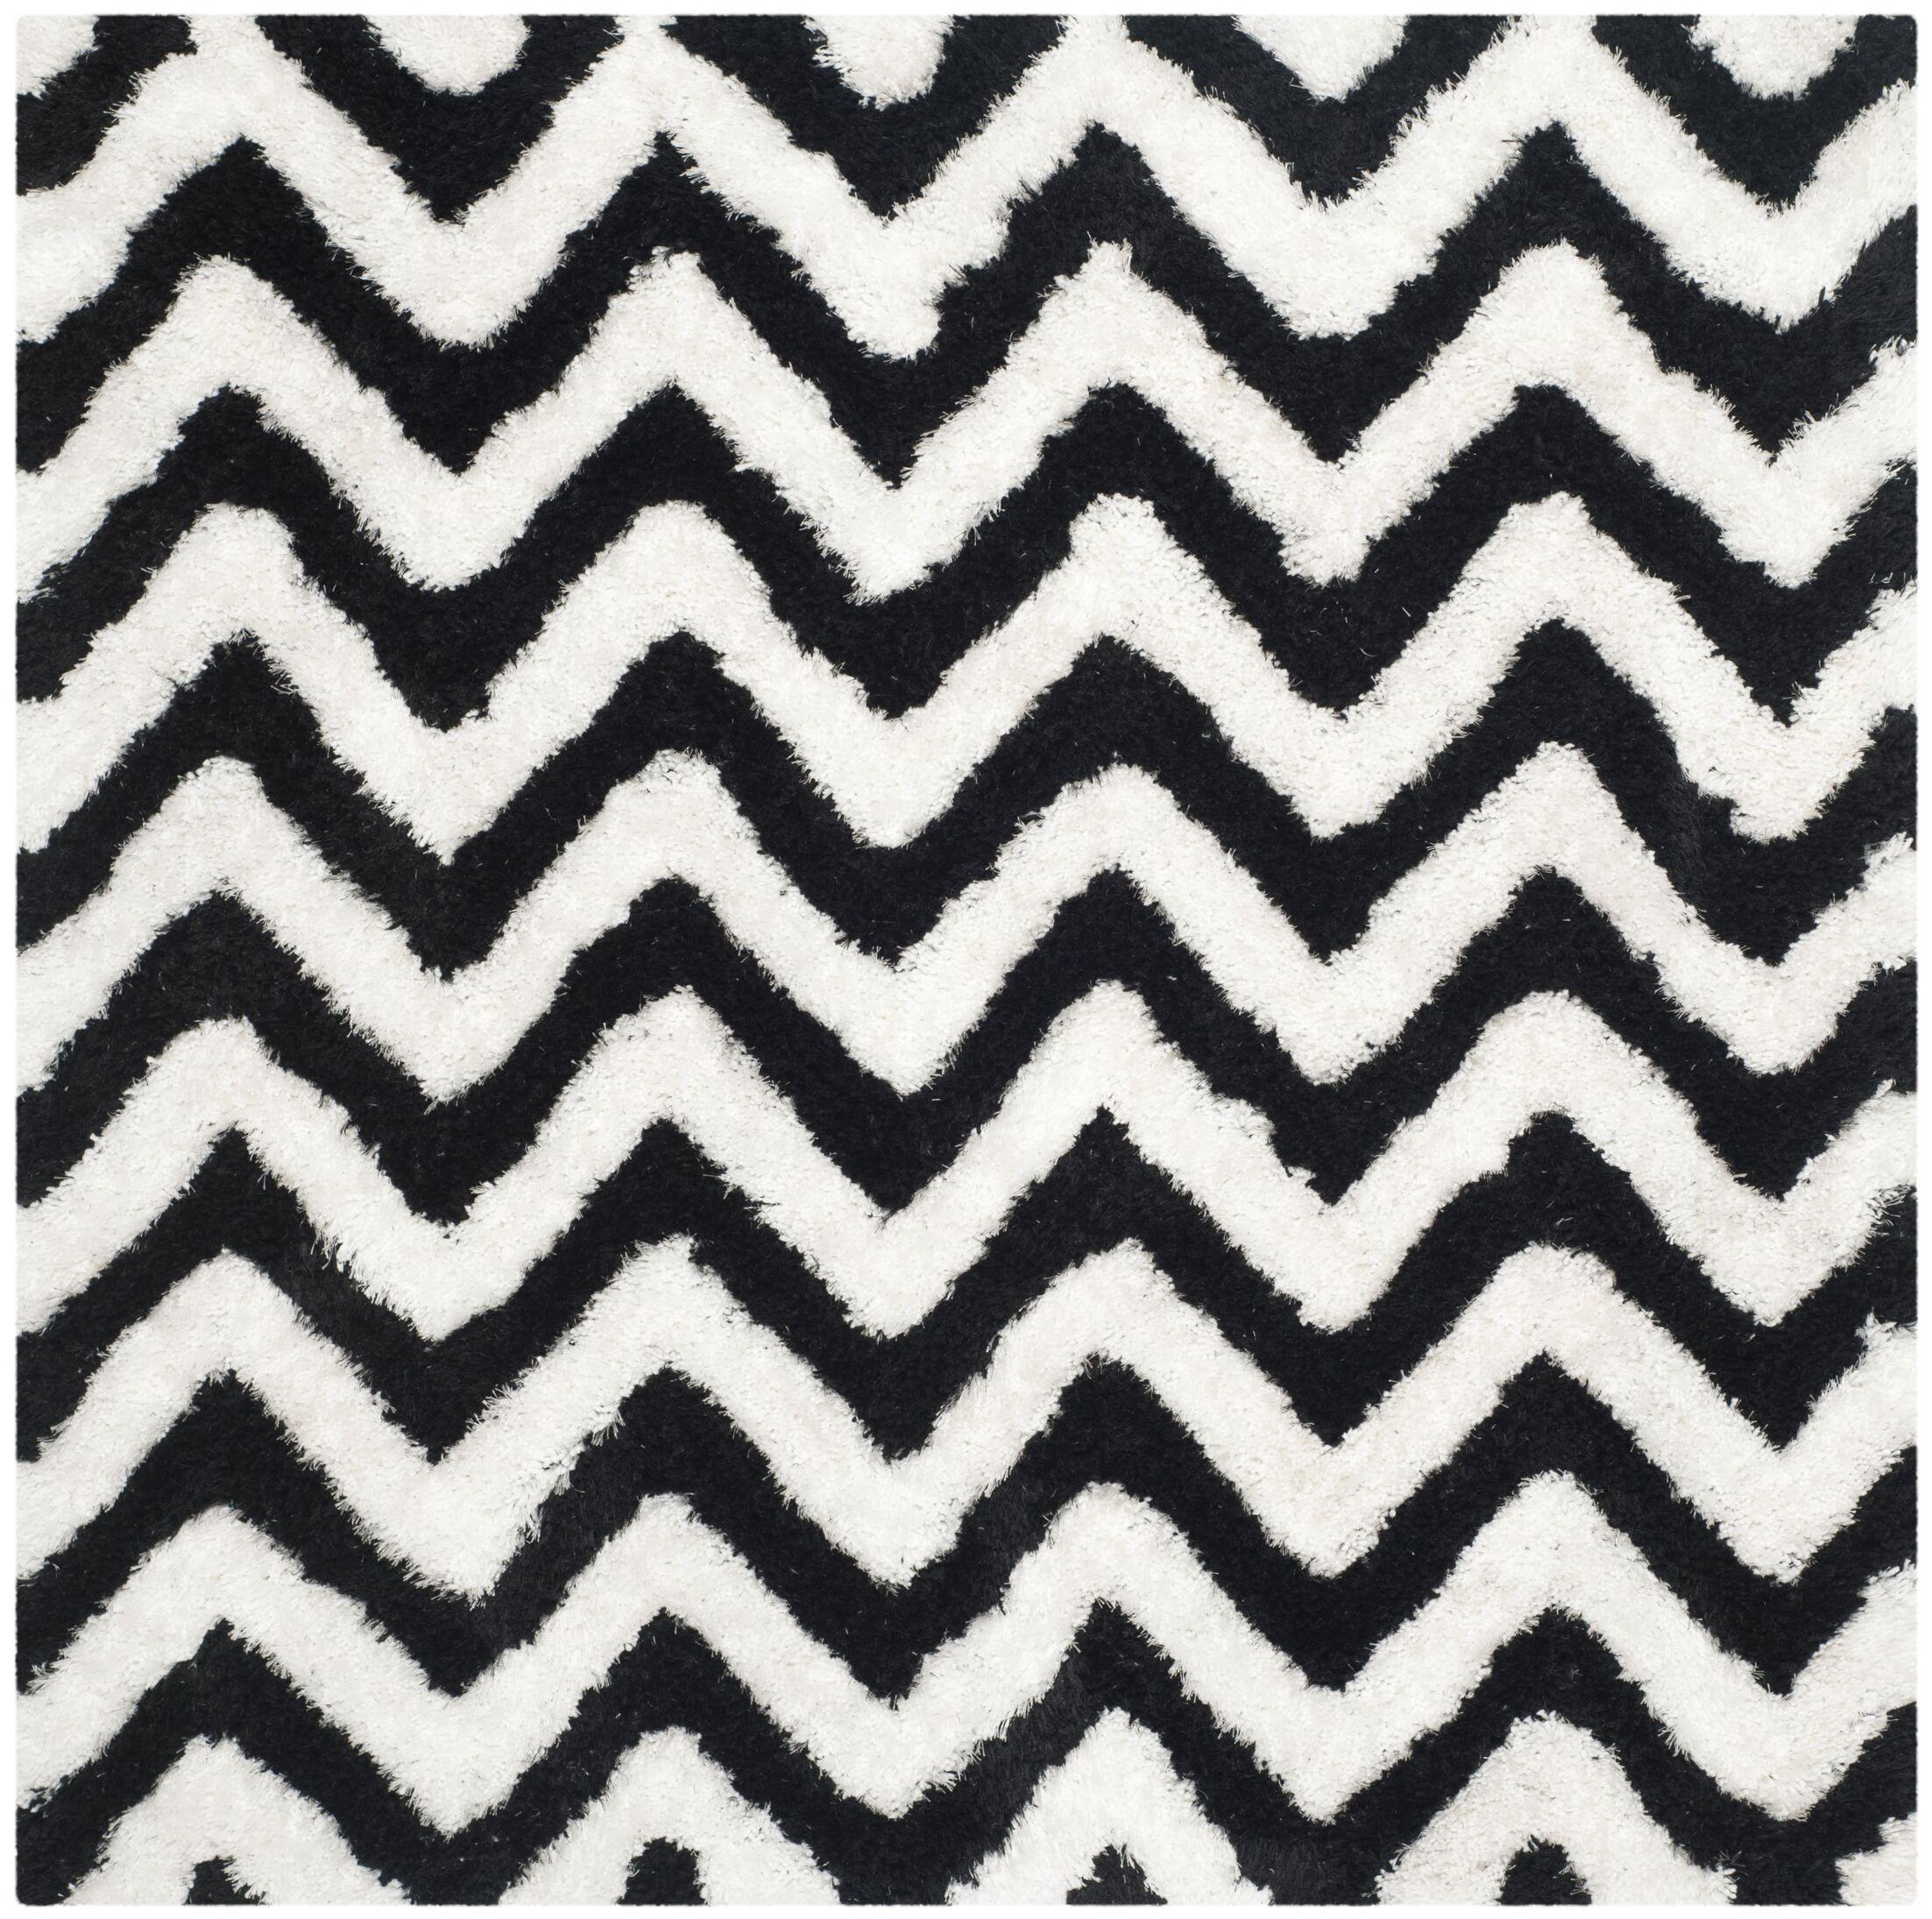 Barcelona Shag Hand-Tufted Cotton Ivory/Black Area Rug Rug Size: Square 5'